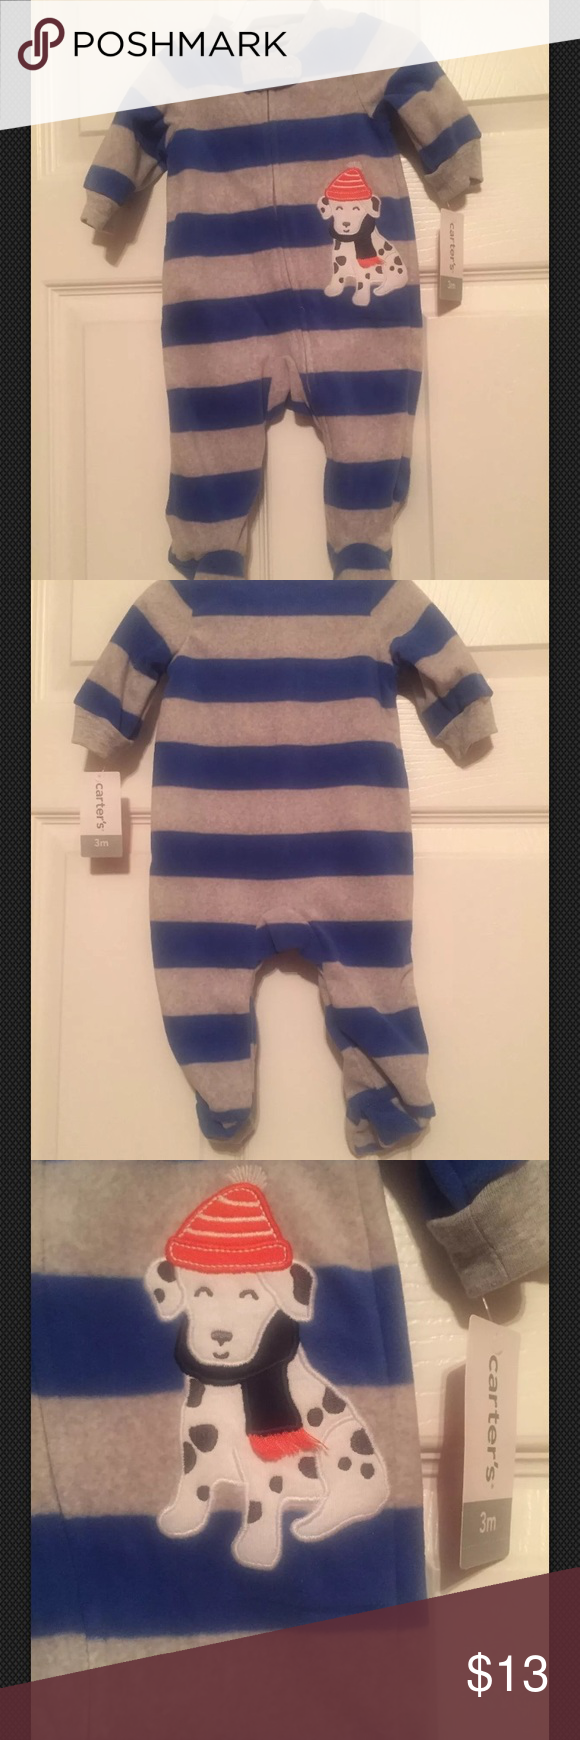 baf7884c8ae8 Carter s Baby Pajamas 3 Months Blue Gray